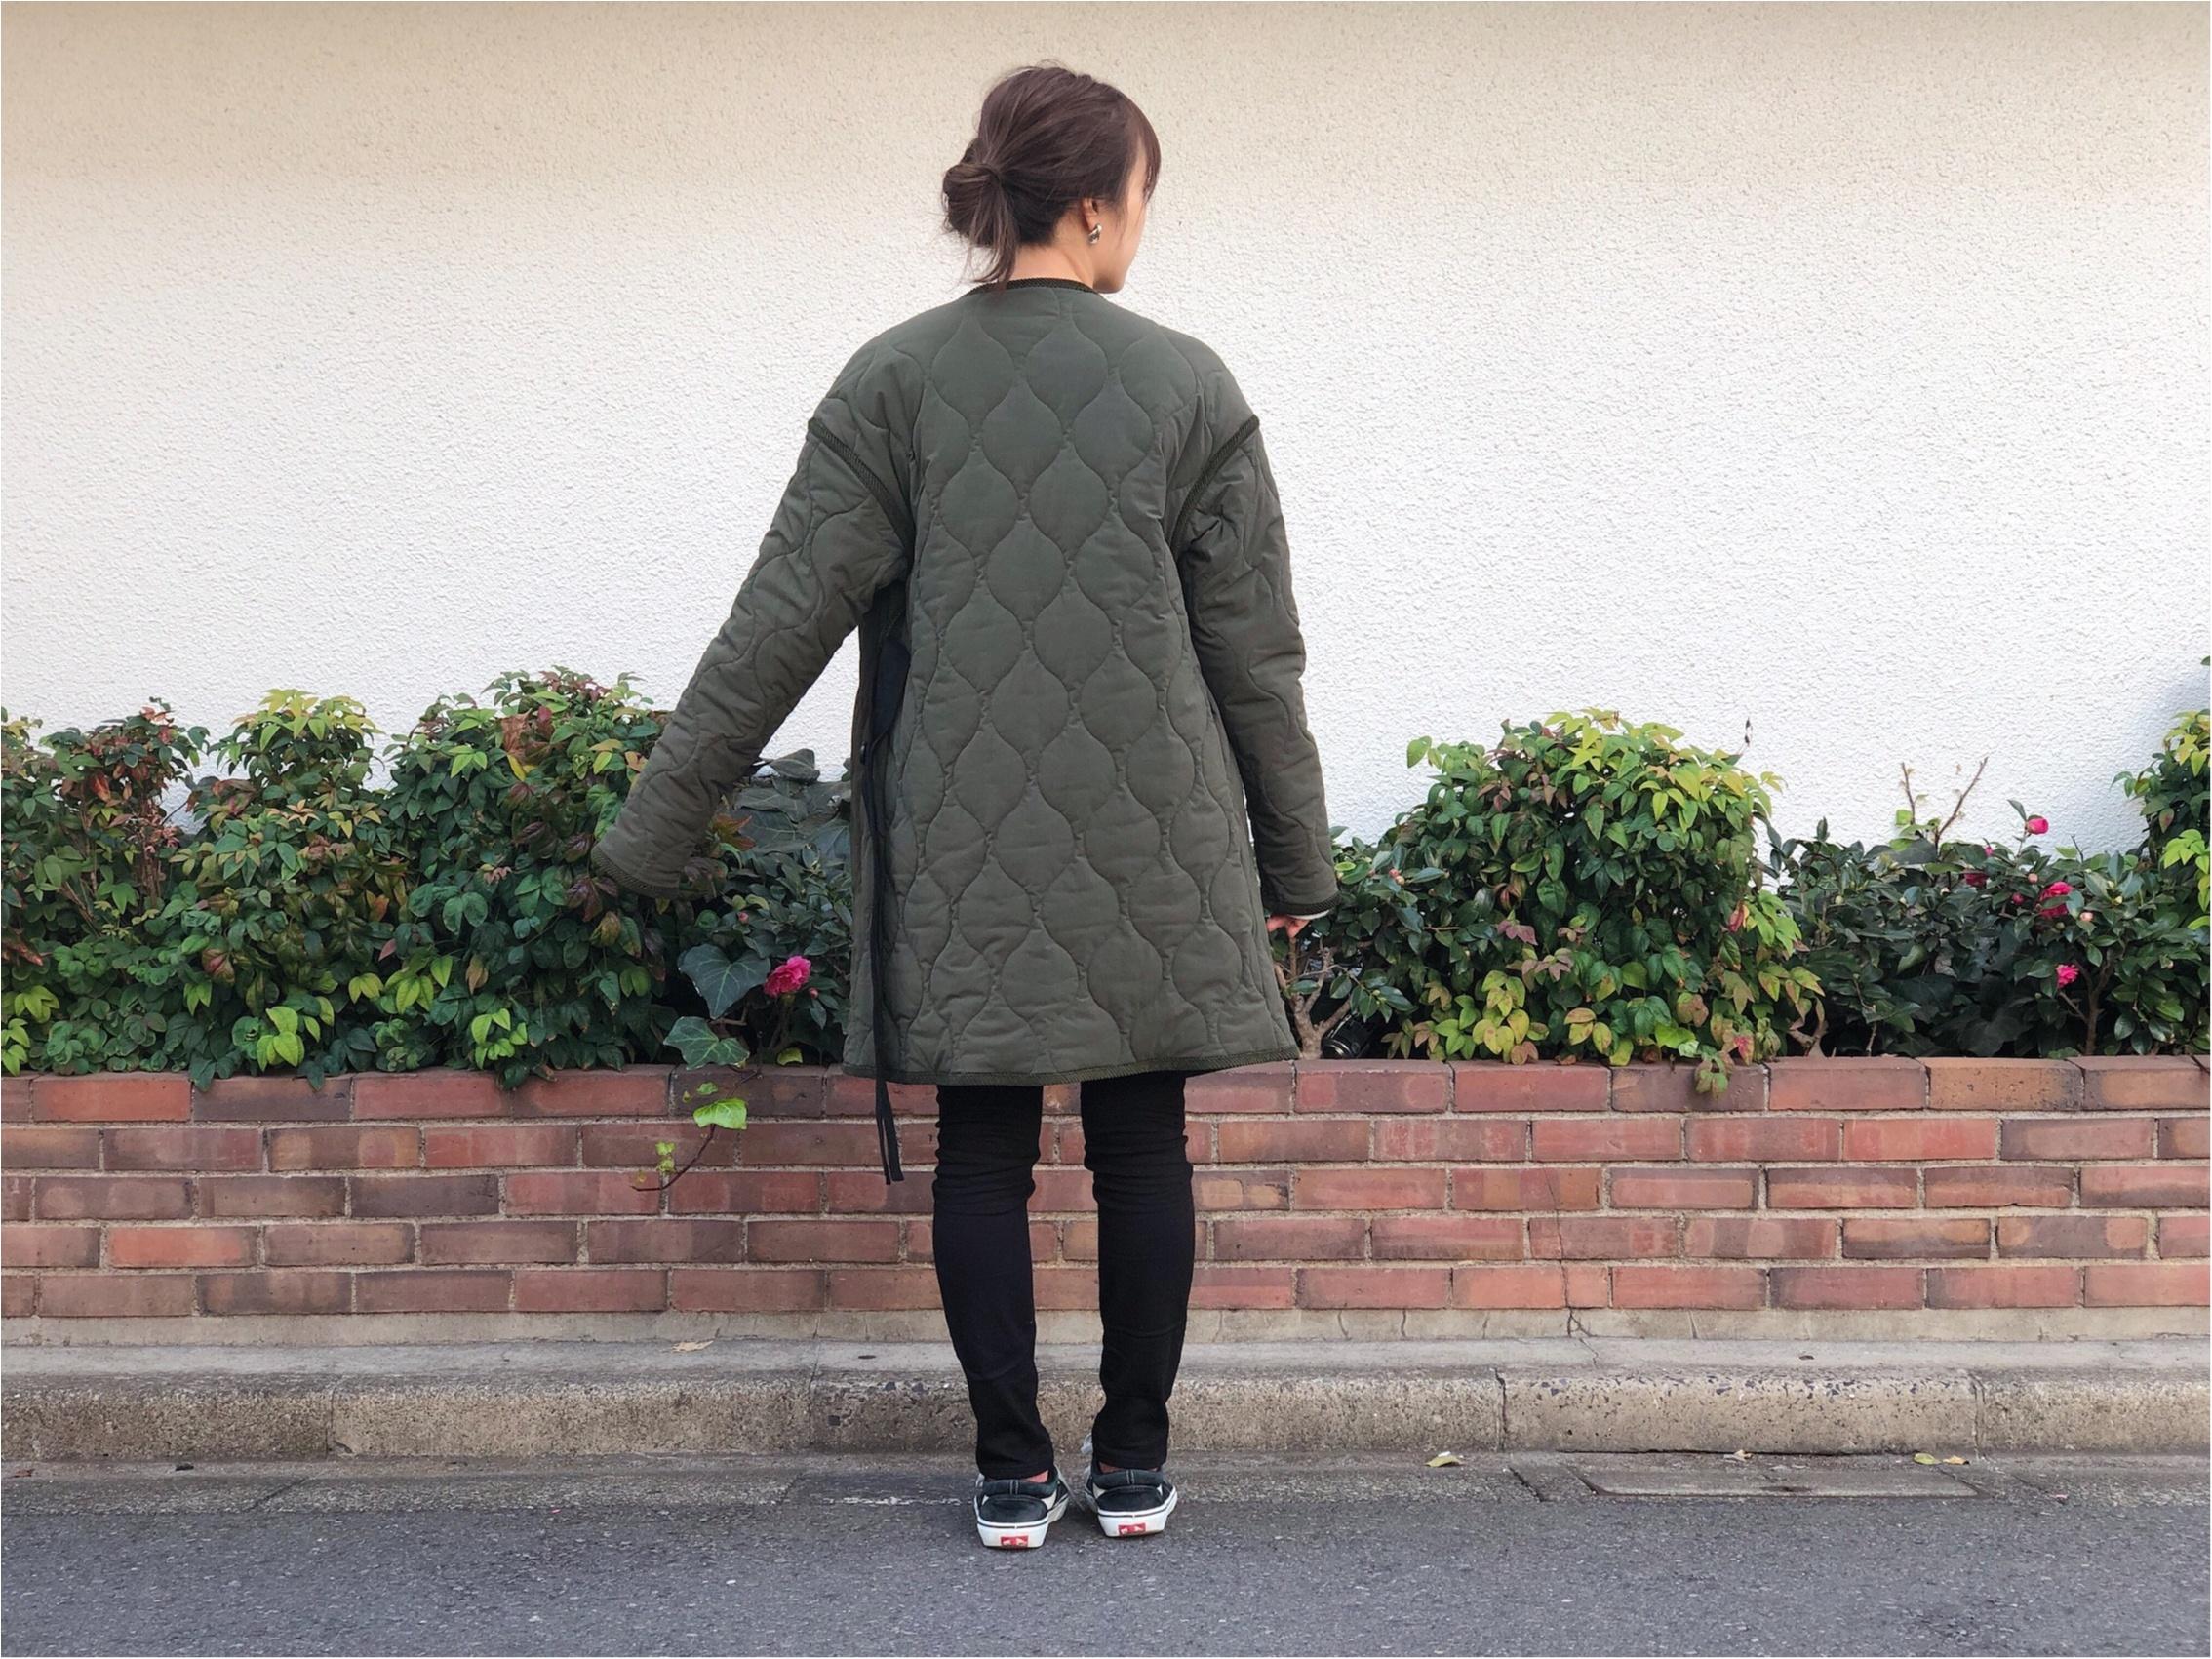 《STUDIOUS×田中亜希子さん》可愛すぎるコラボ商品が思った以上にあったかすぎる!この冬ヘビロテ決定の上着とボトム!_5